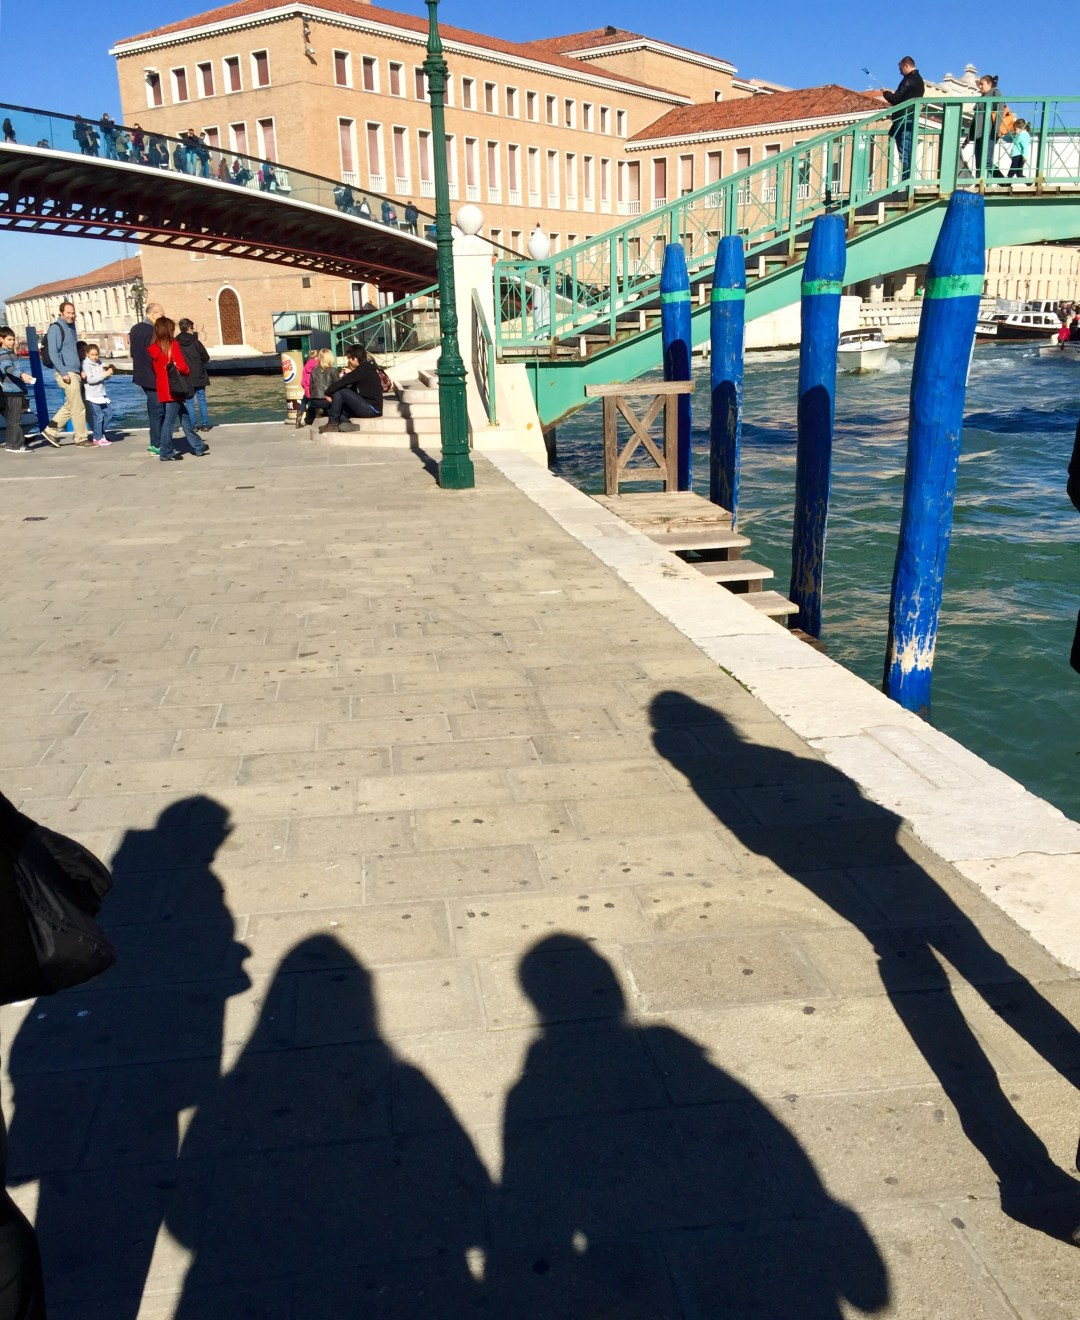 Meeting girlfriends in Italy